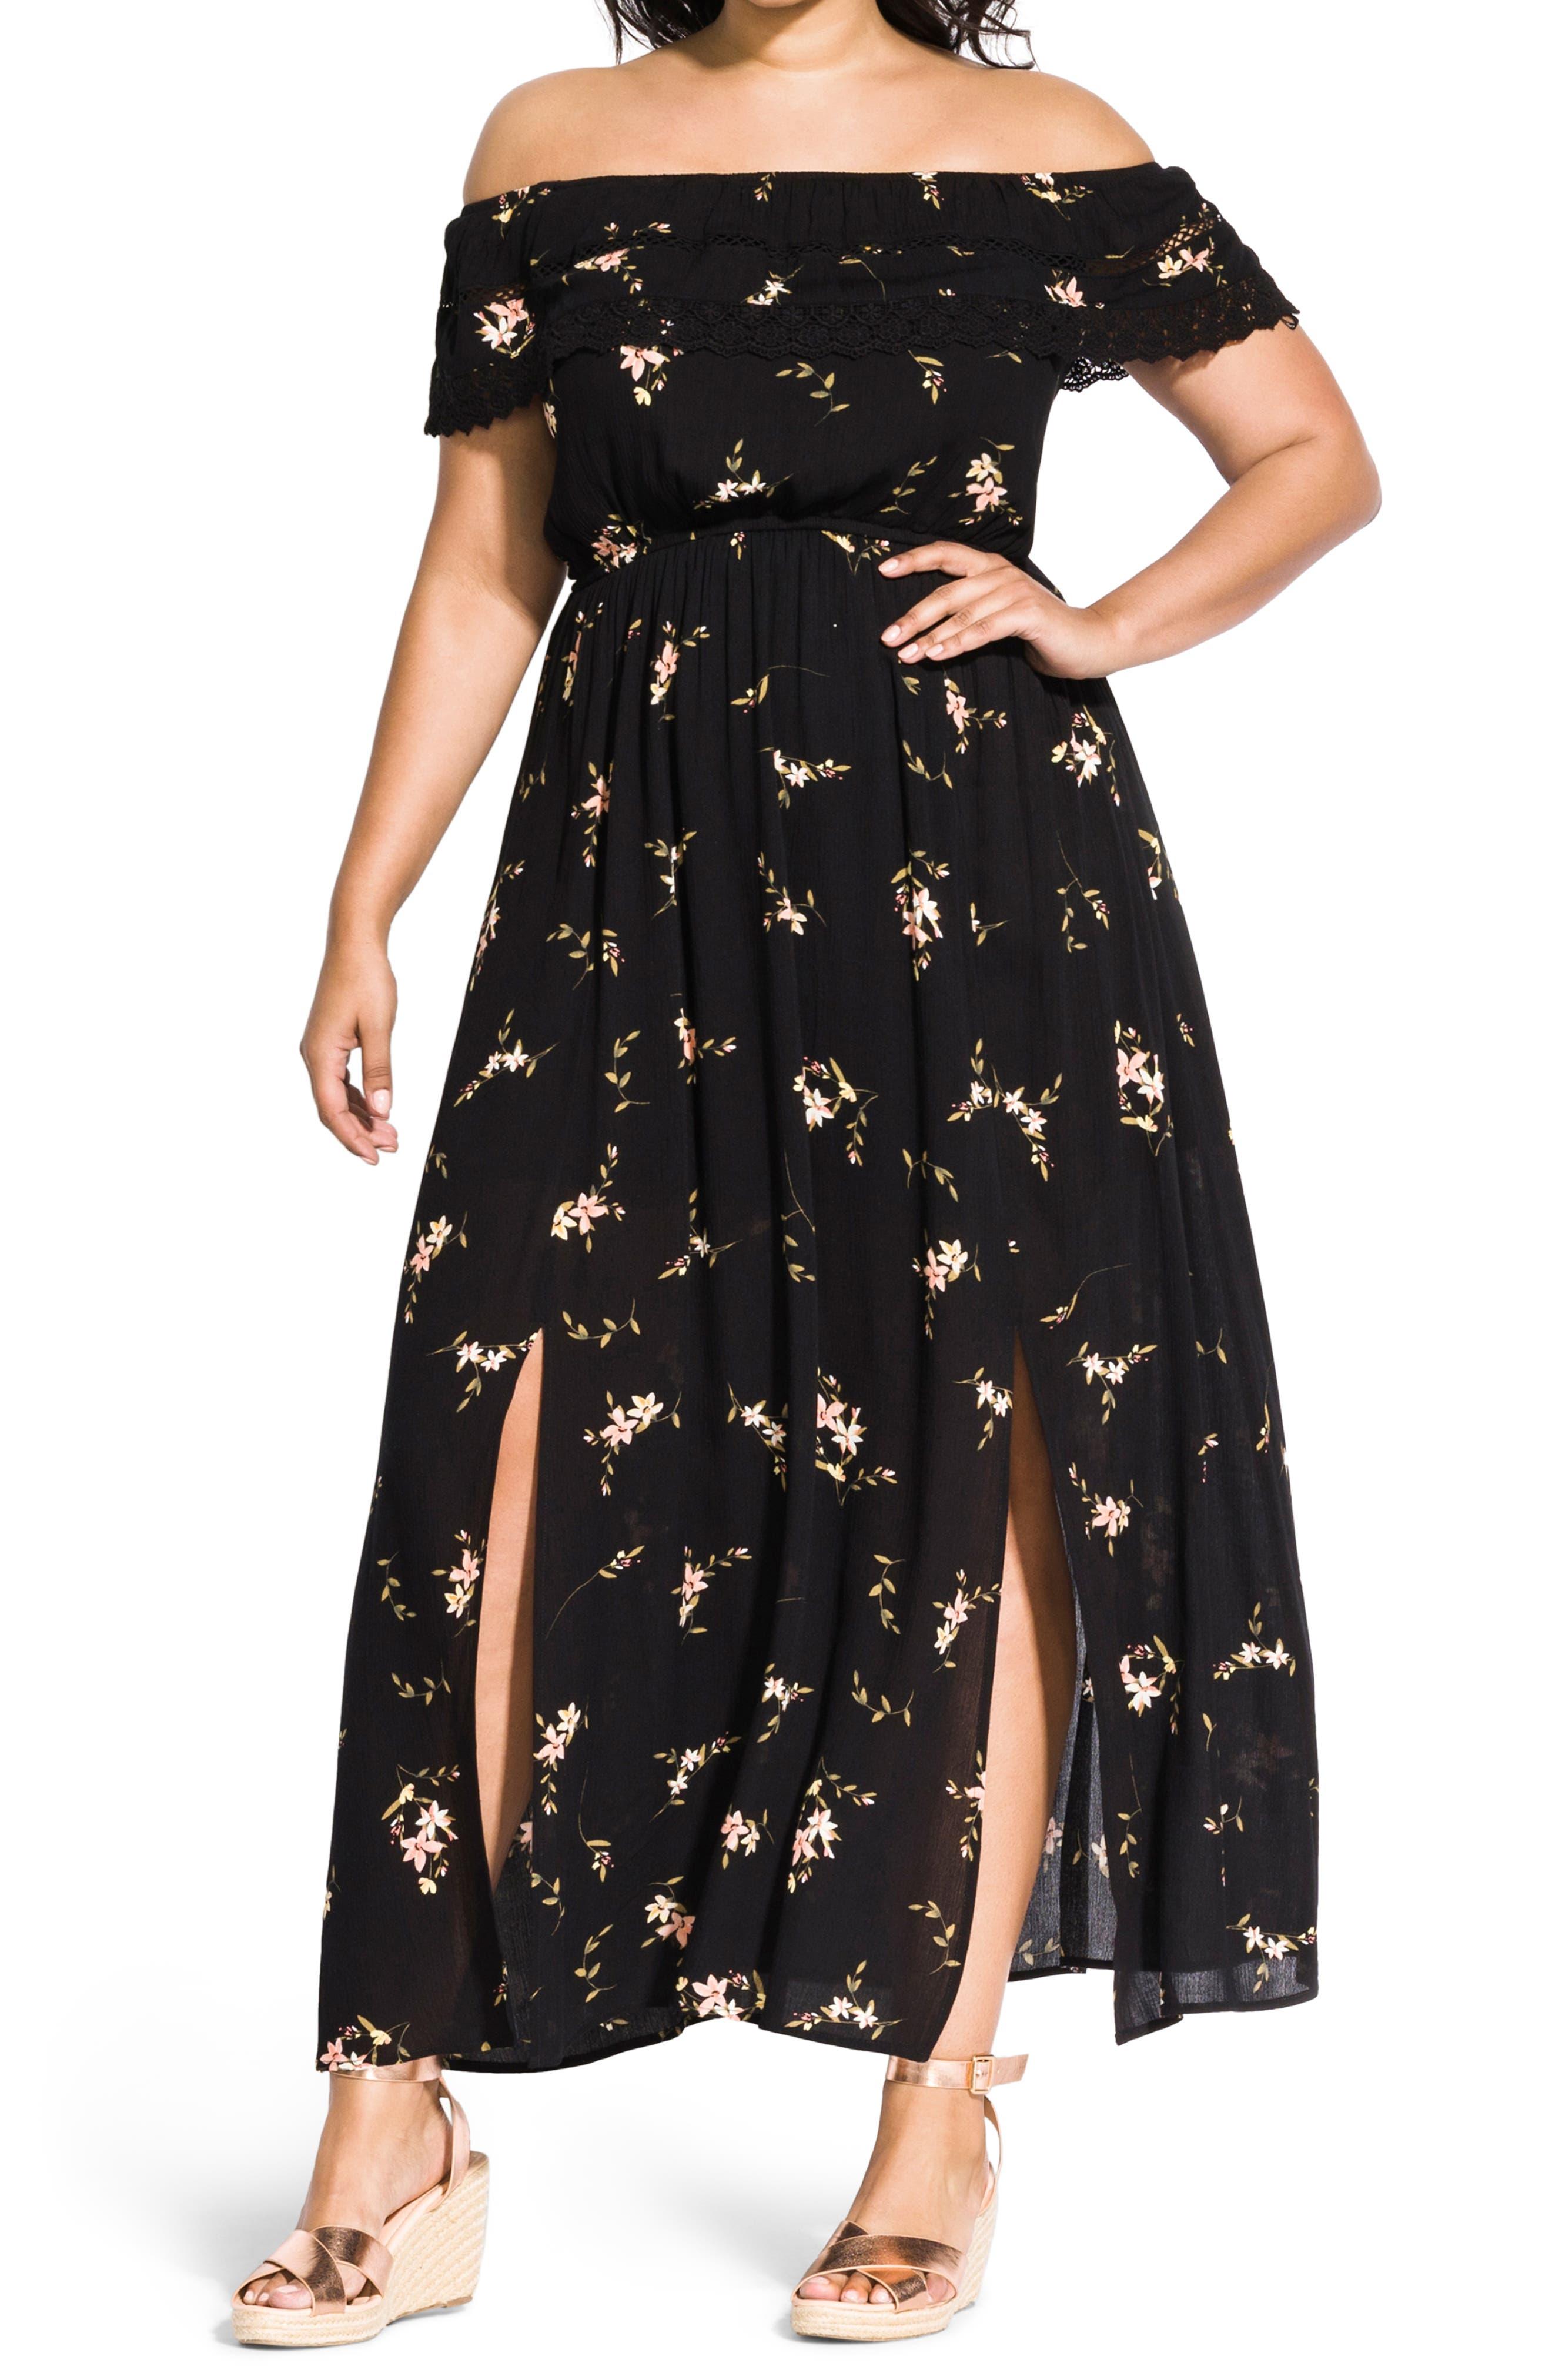 CITY CHIC Off the Shoulder Floral Maxi Dress, Main, color, AERIAL FLORAL